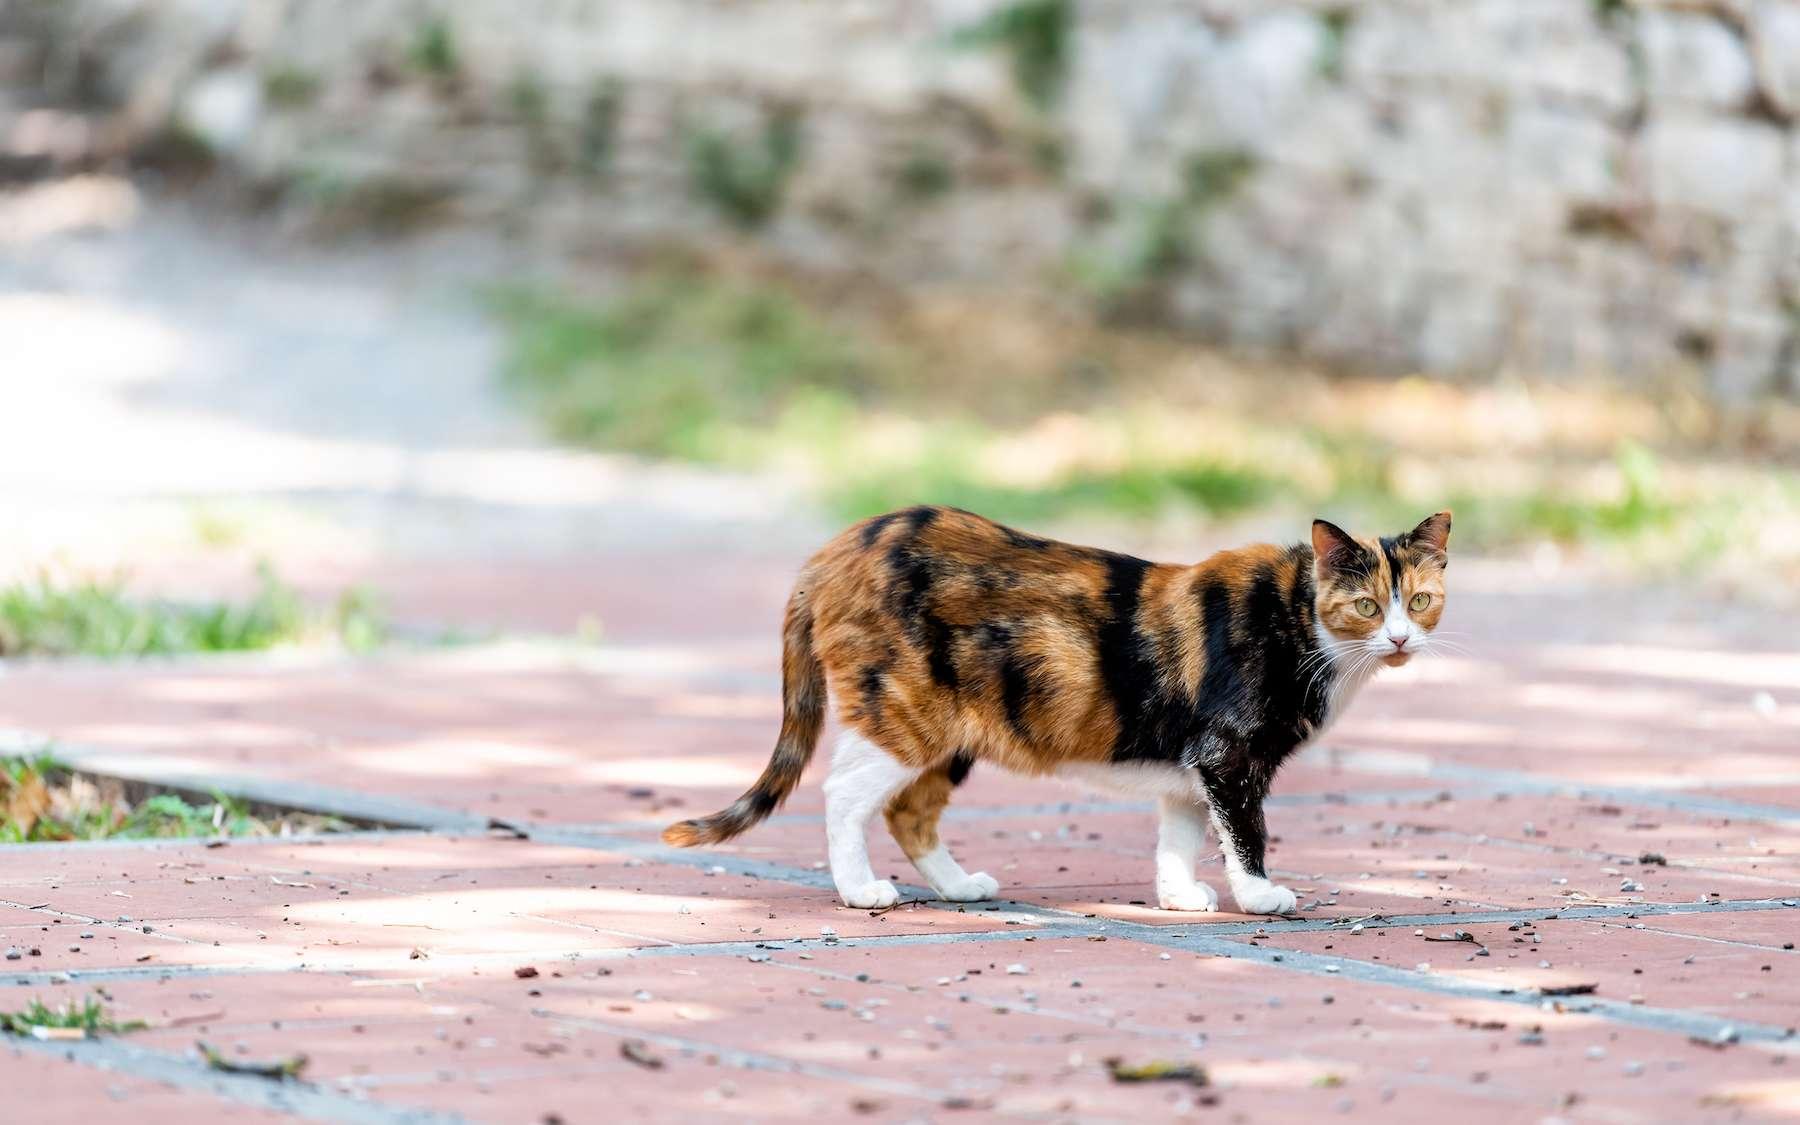 Un chat, atteint d'une maladie rare, terrorise l'Italie